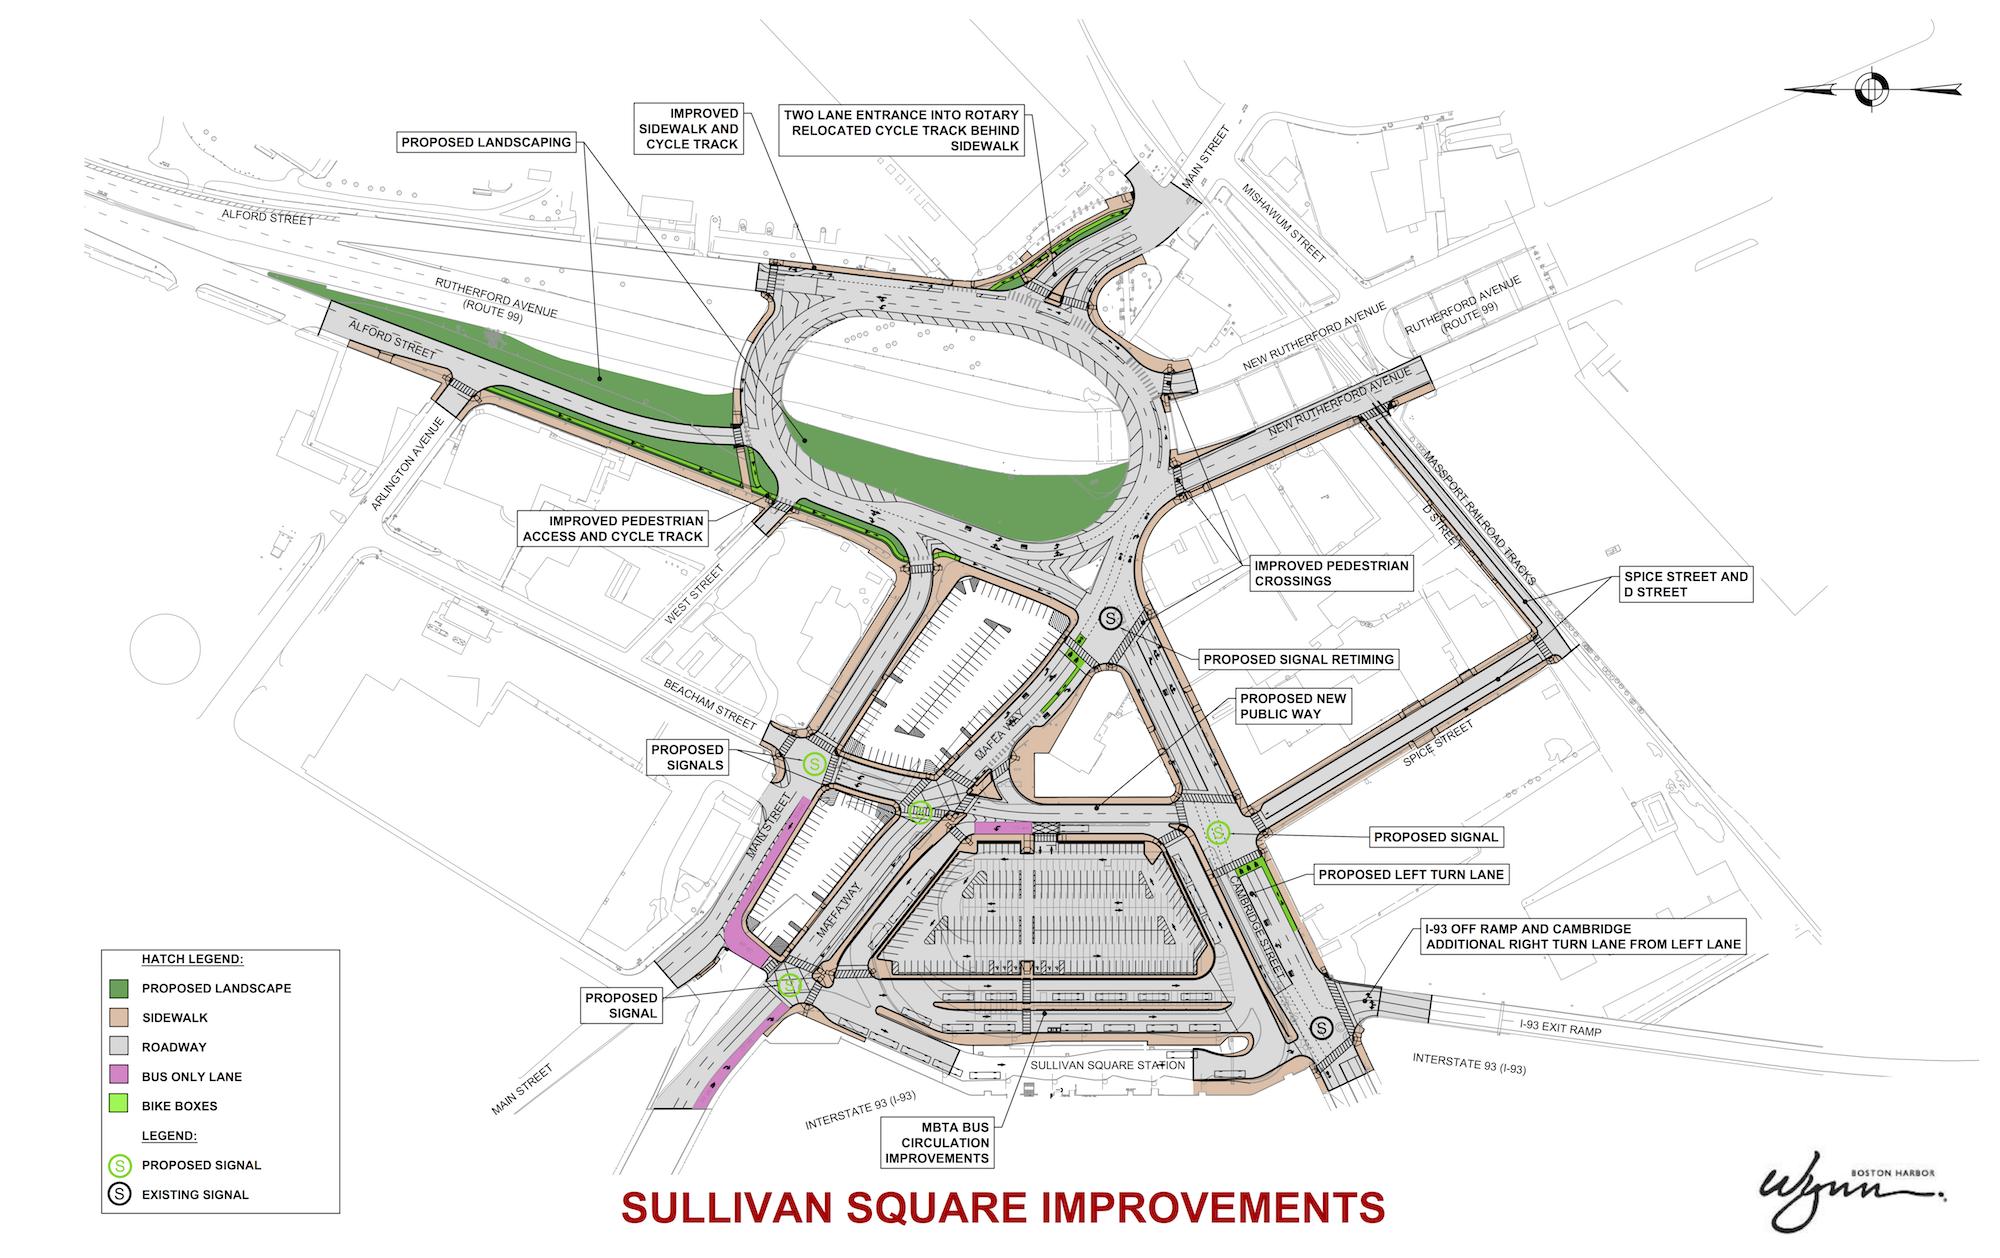 Graphic representation of the proposed improvements to Sullivan Square